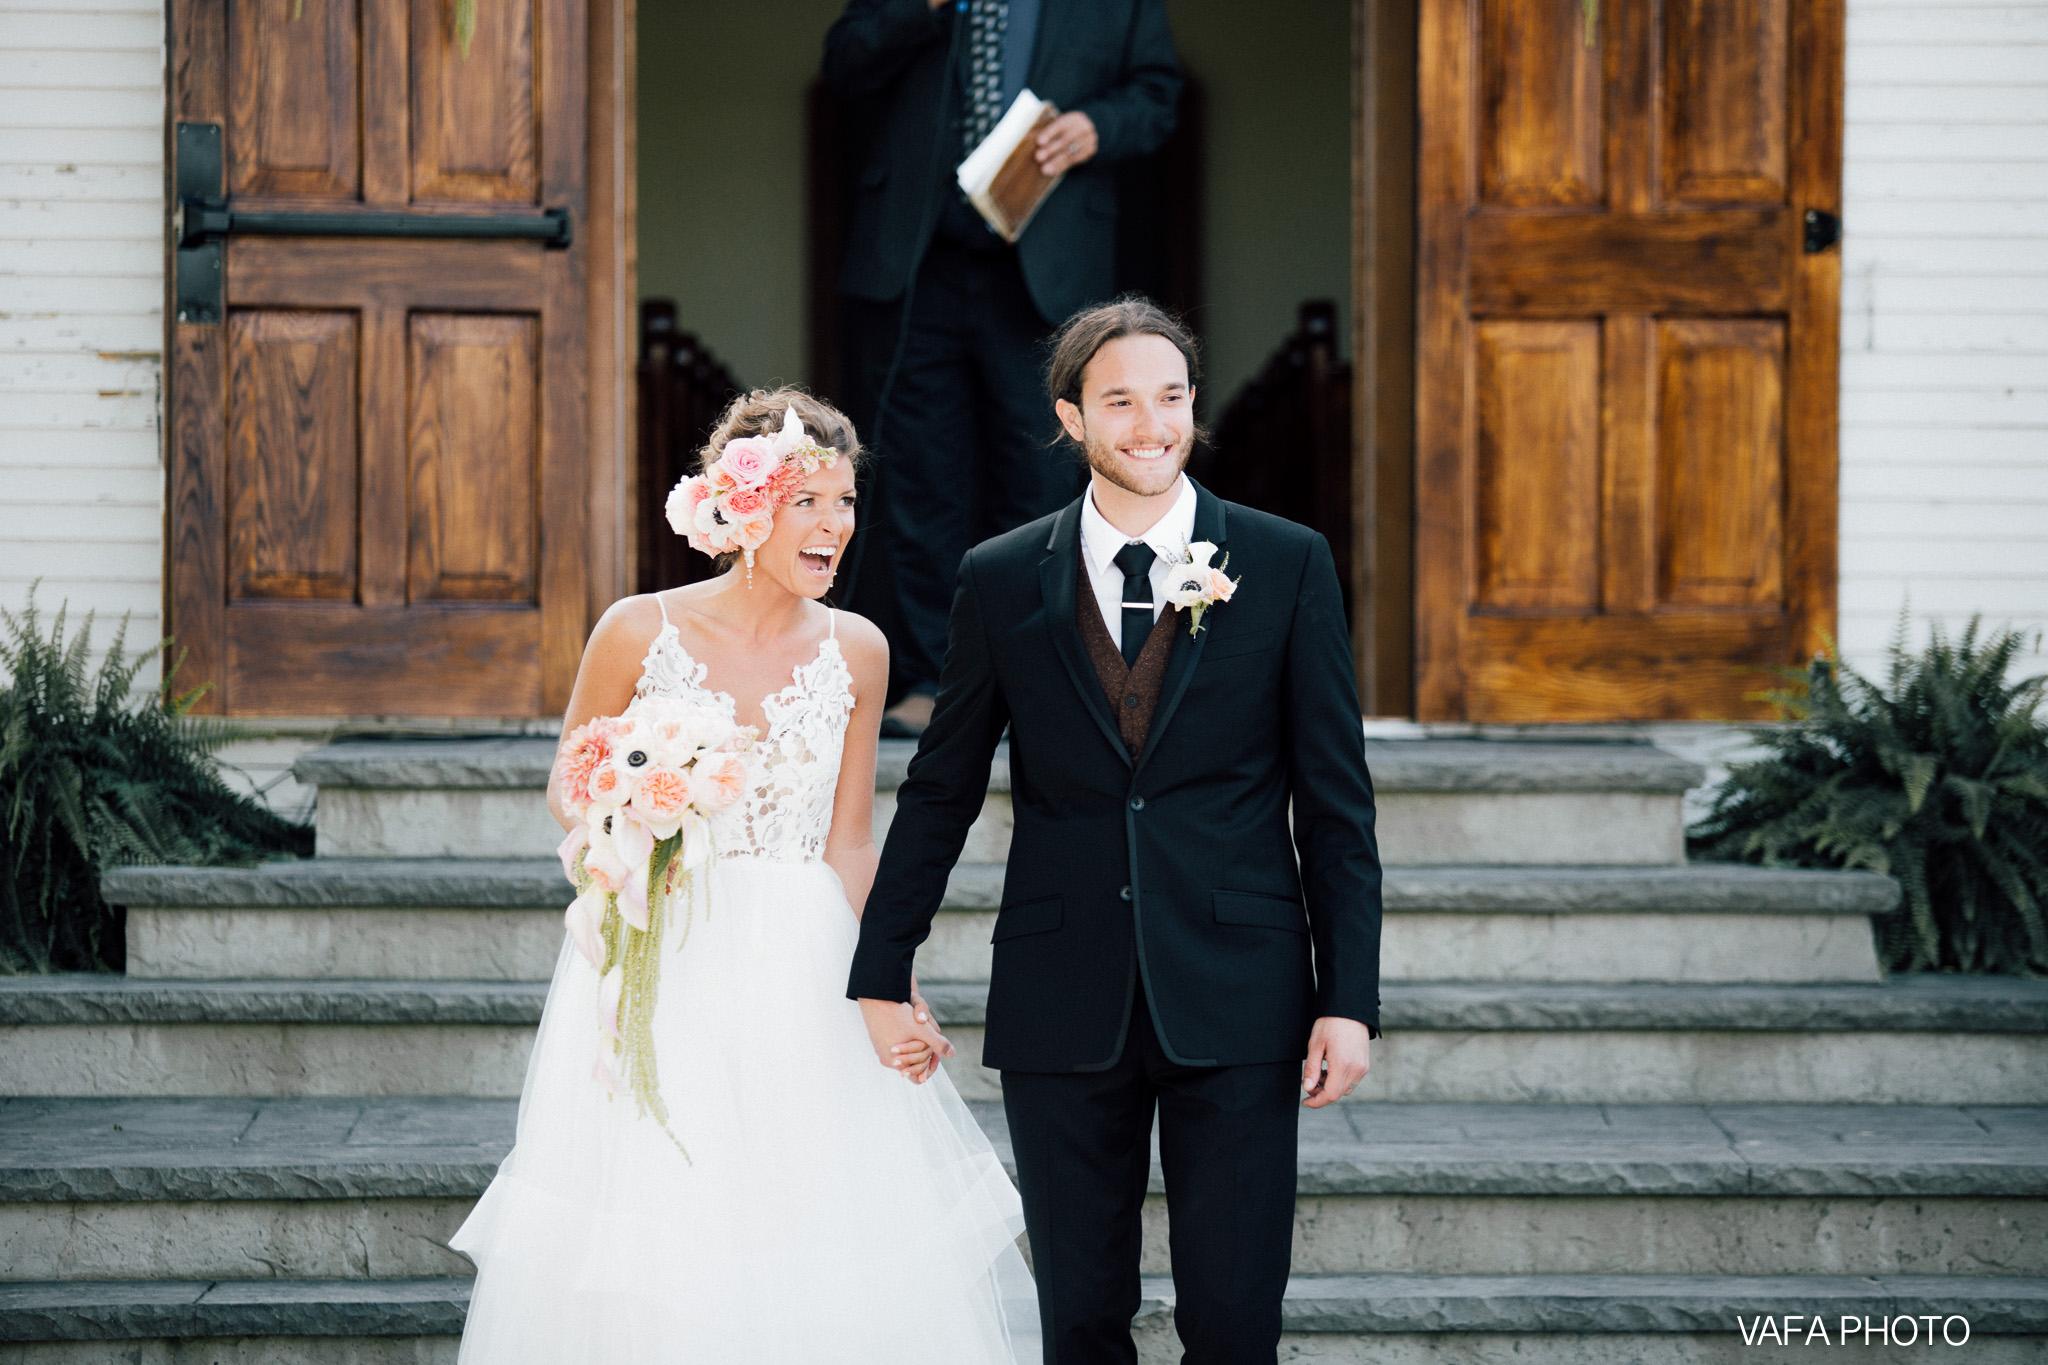 The-Felt-Estate-Wedding-Kailie-David-Vafa-Photo-391.jpg